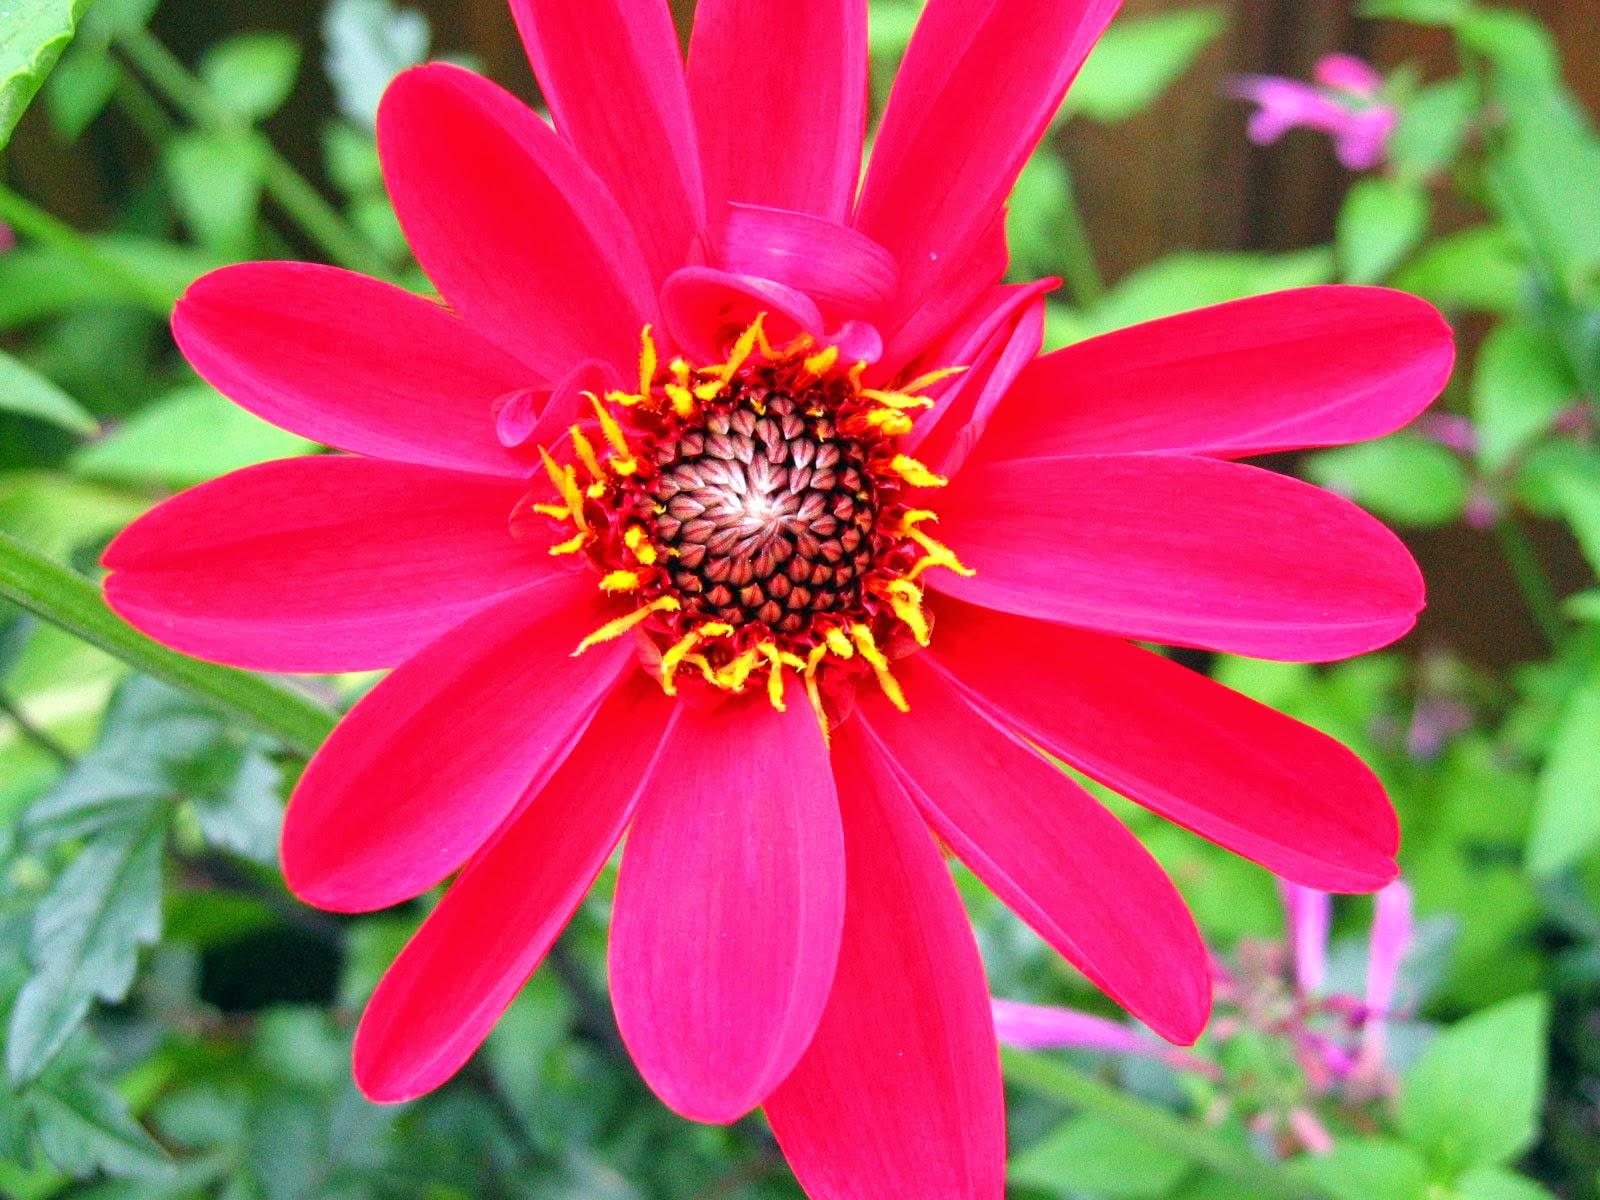 Romantic Flowers: Red Flowers